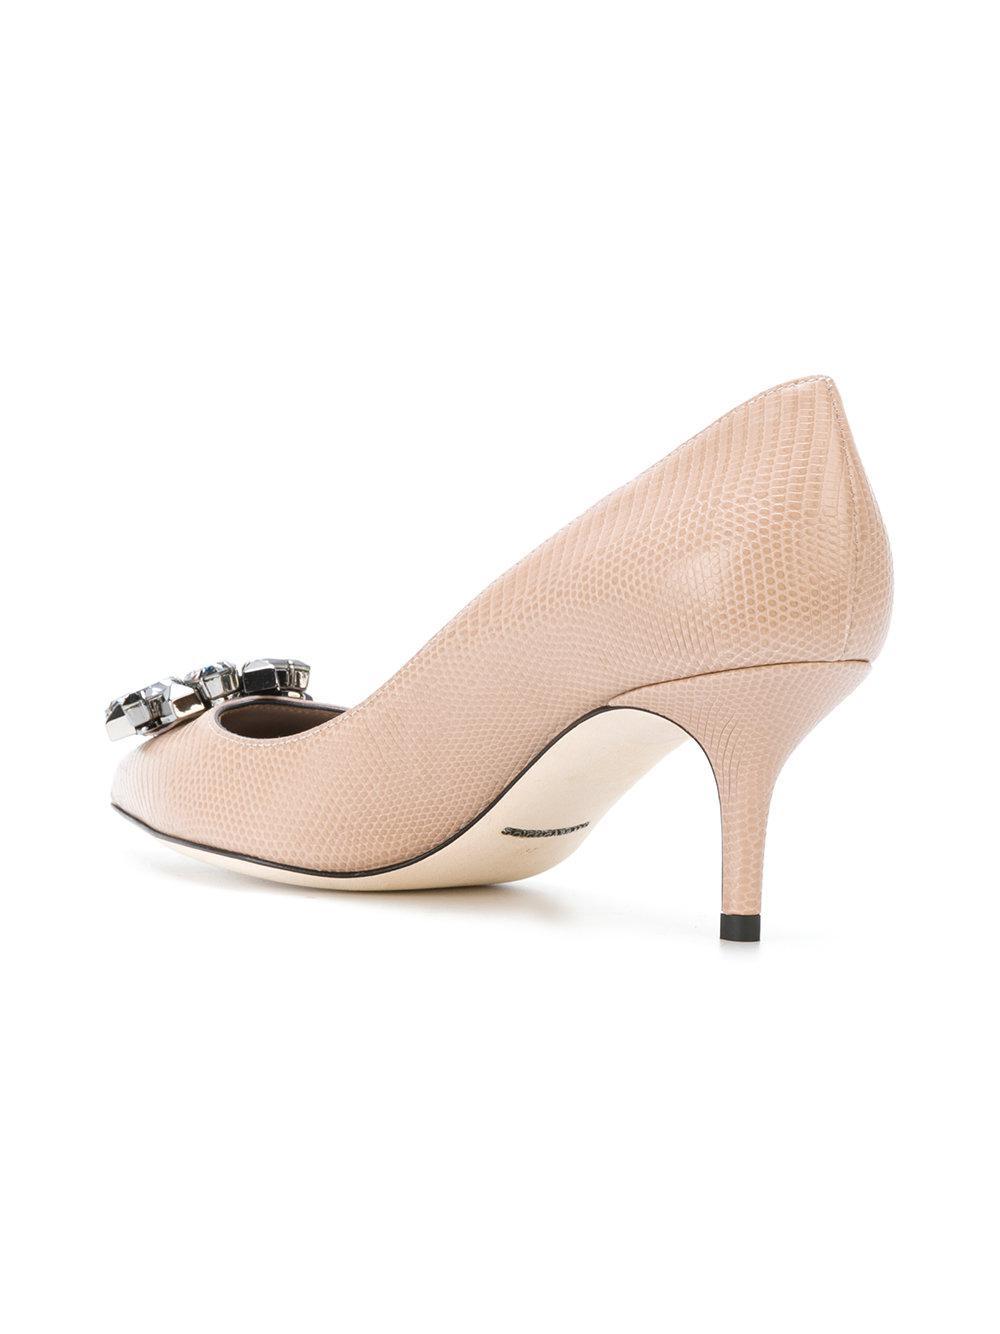 Dolce & Gabbana Pompes 'belluci' - Nude & Tons Neutres 1s7F9UGU22